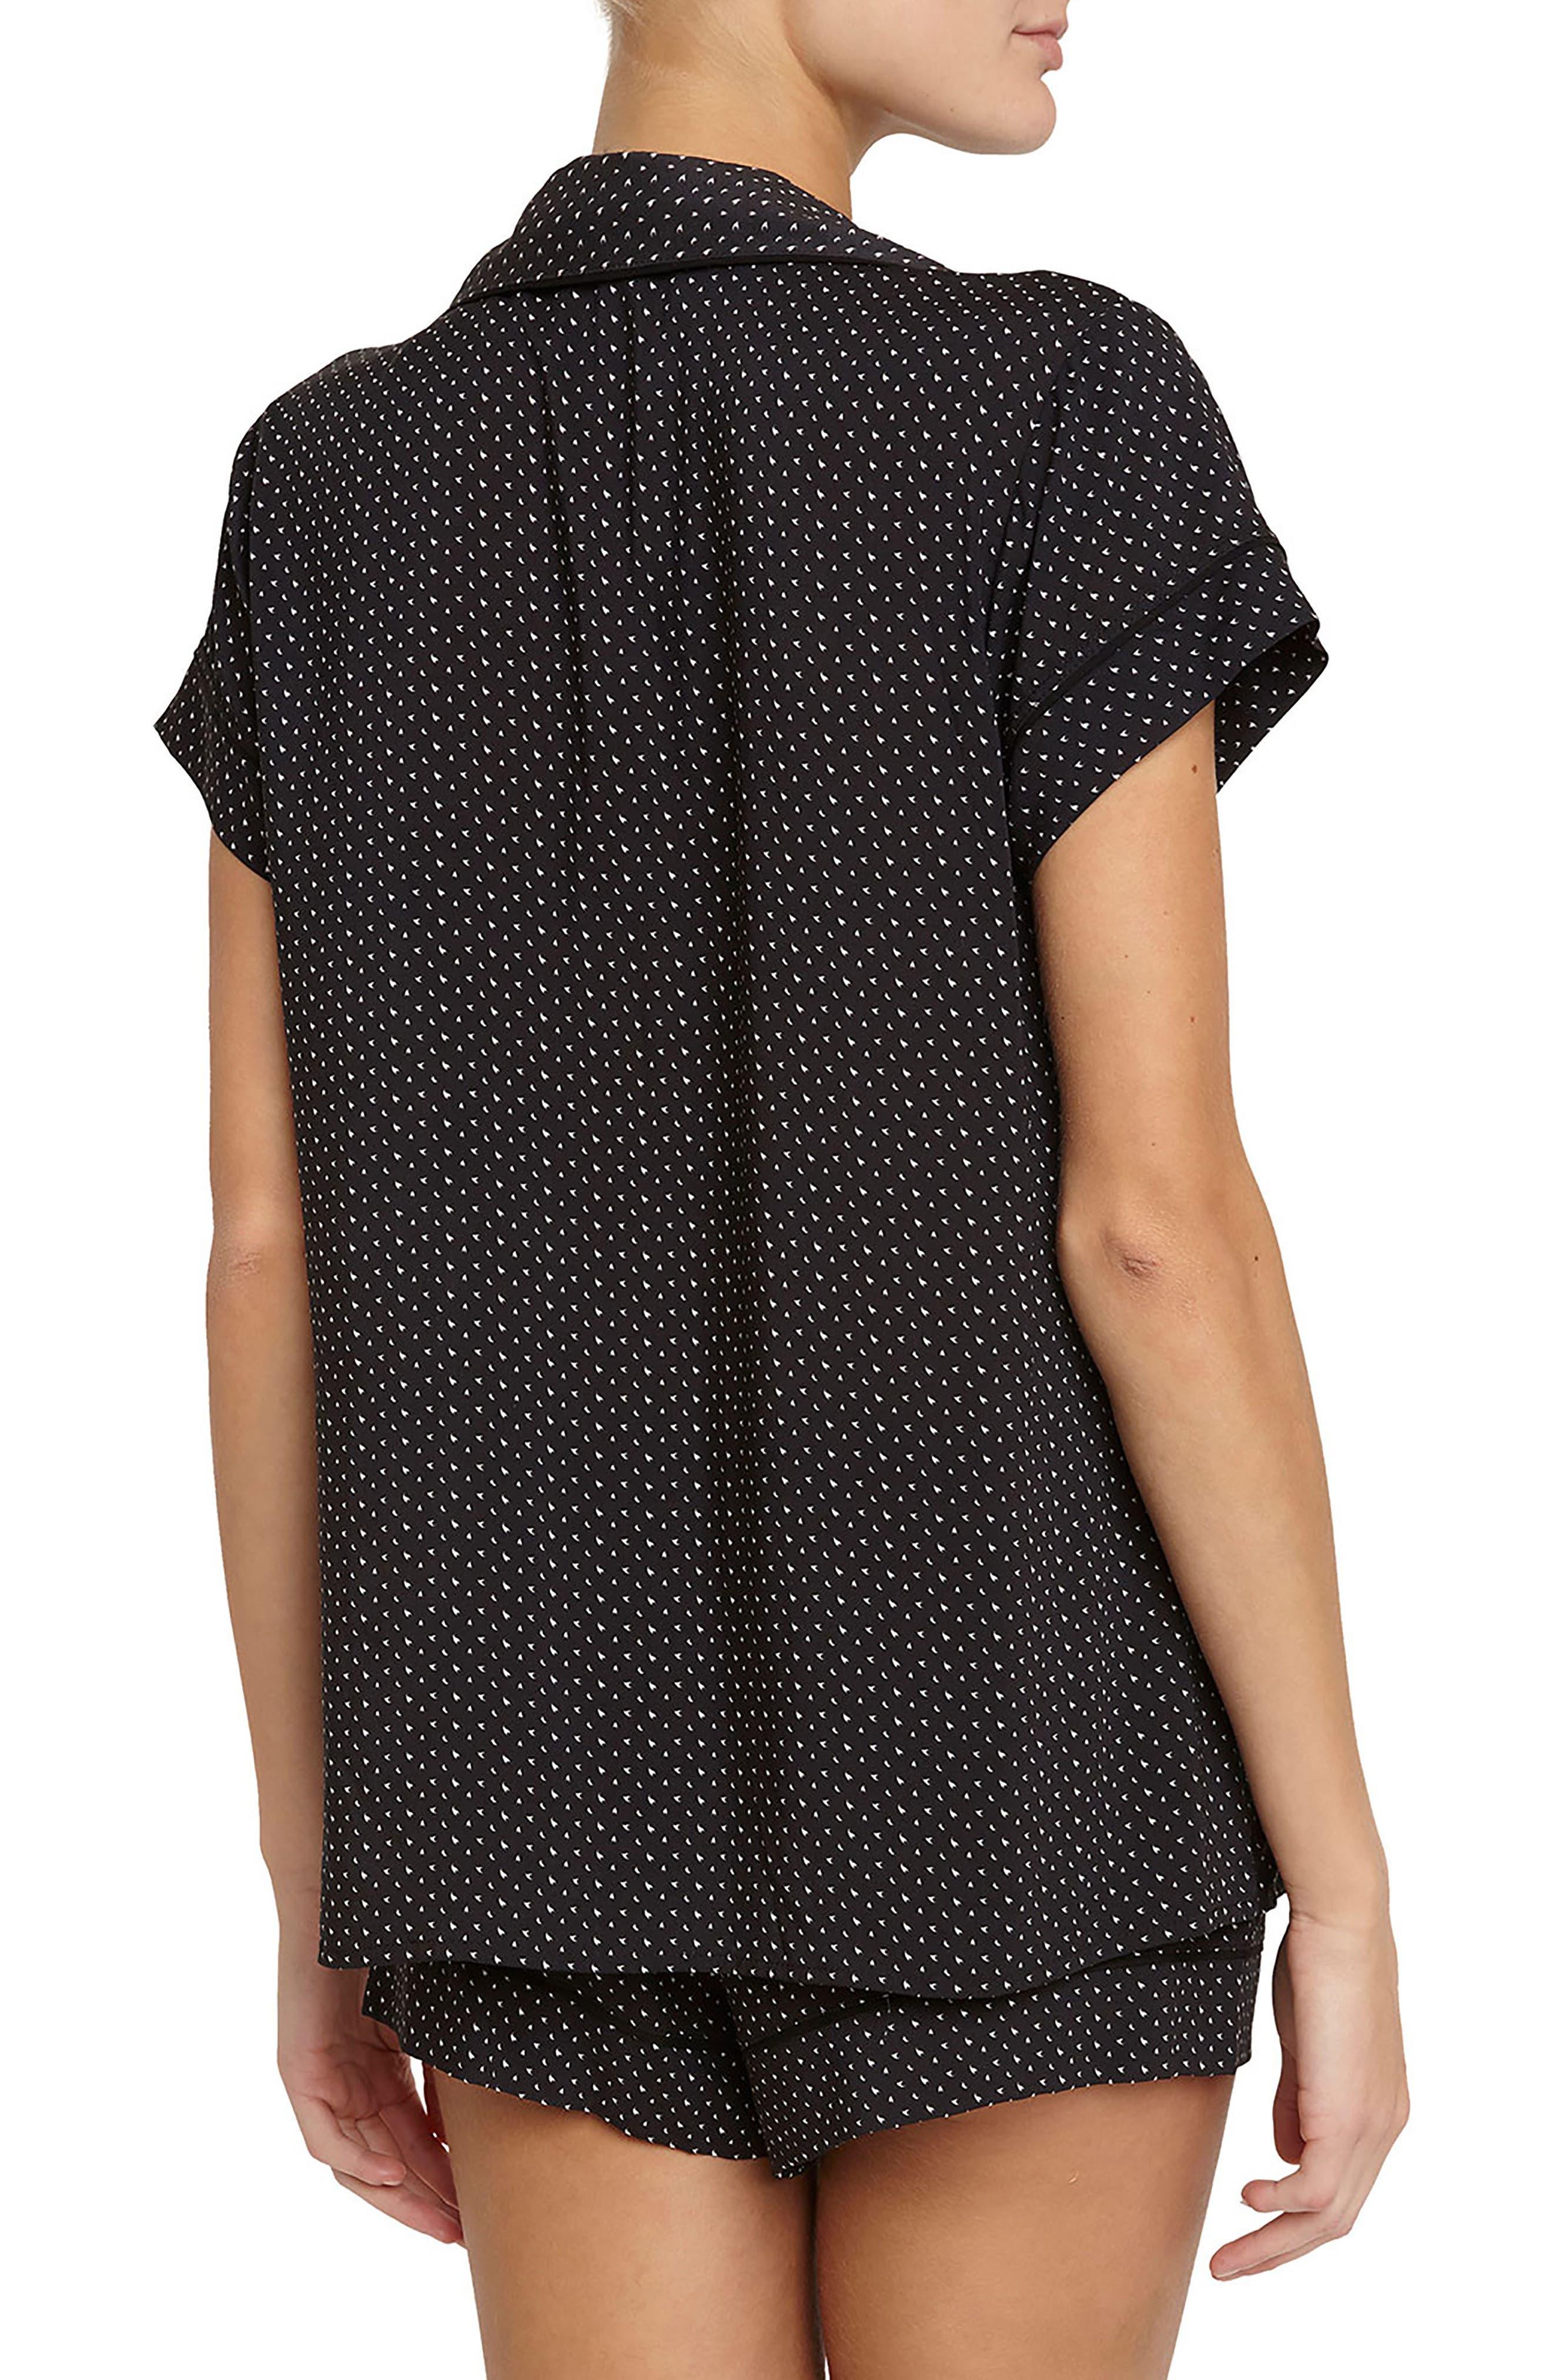 Victoria Short Pajamas,                             Alternate thumbnail 2, color,                             Wish/ Black